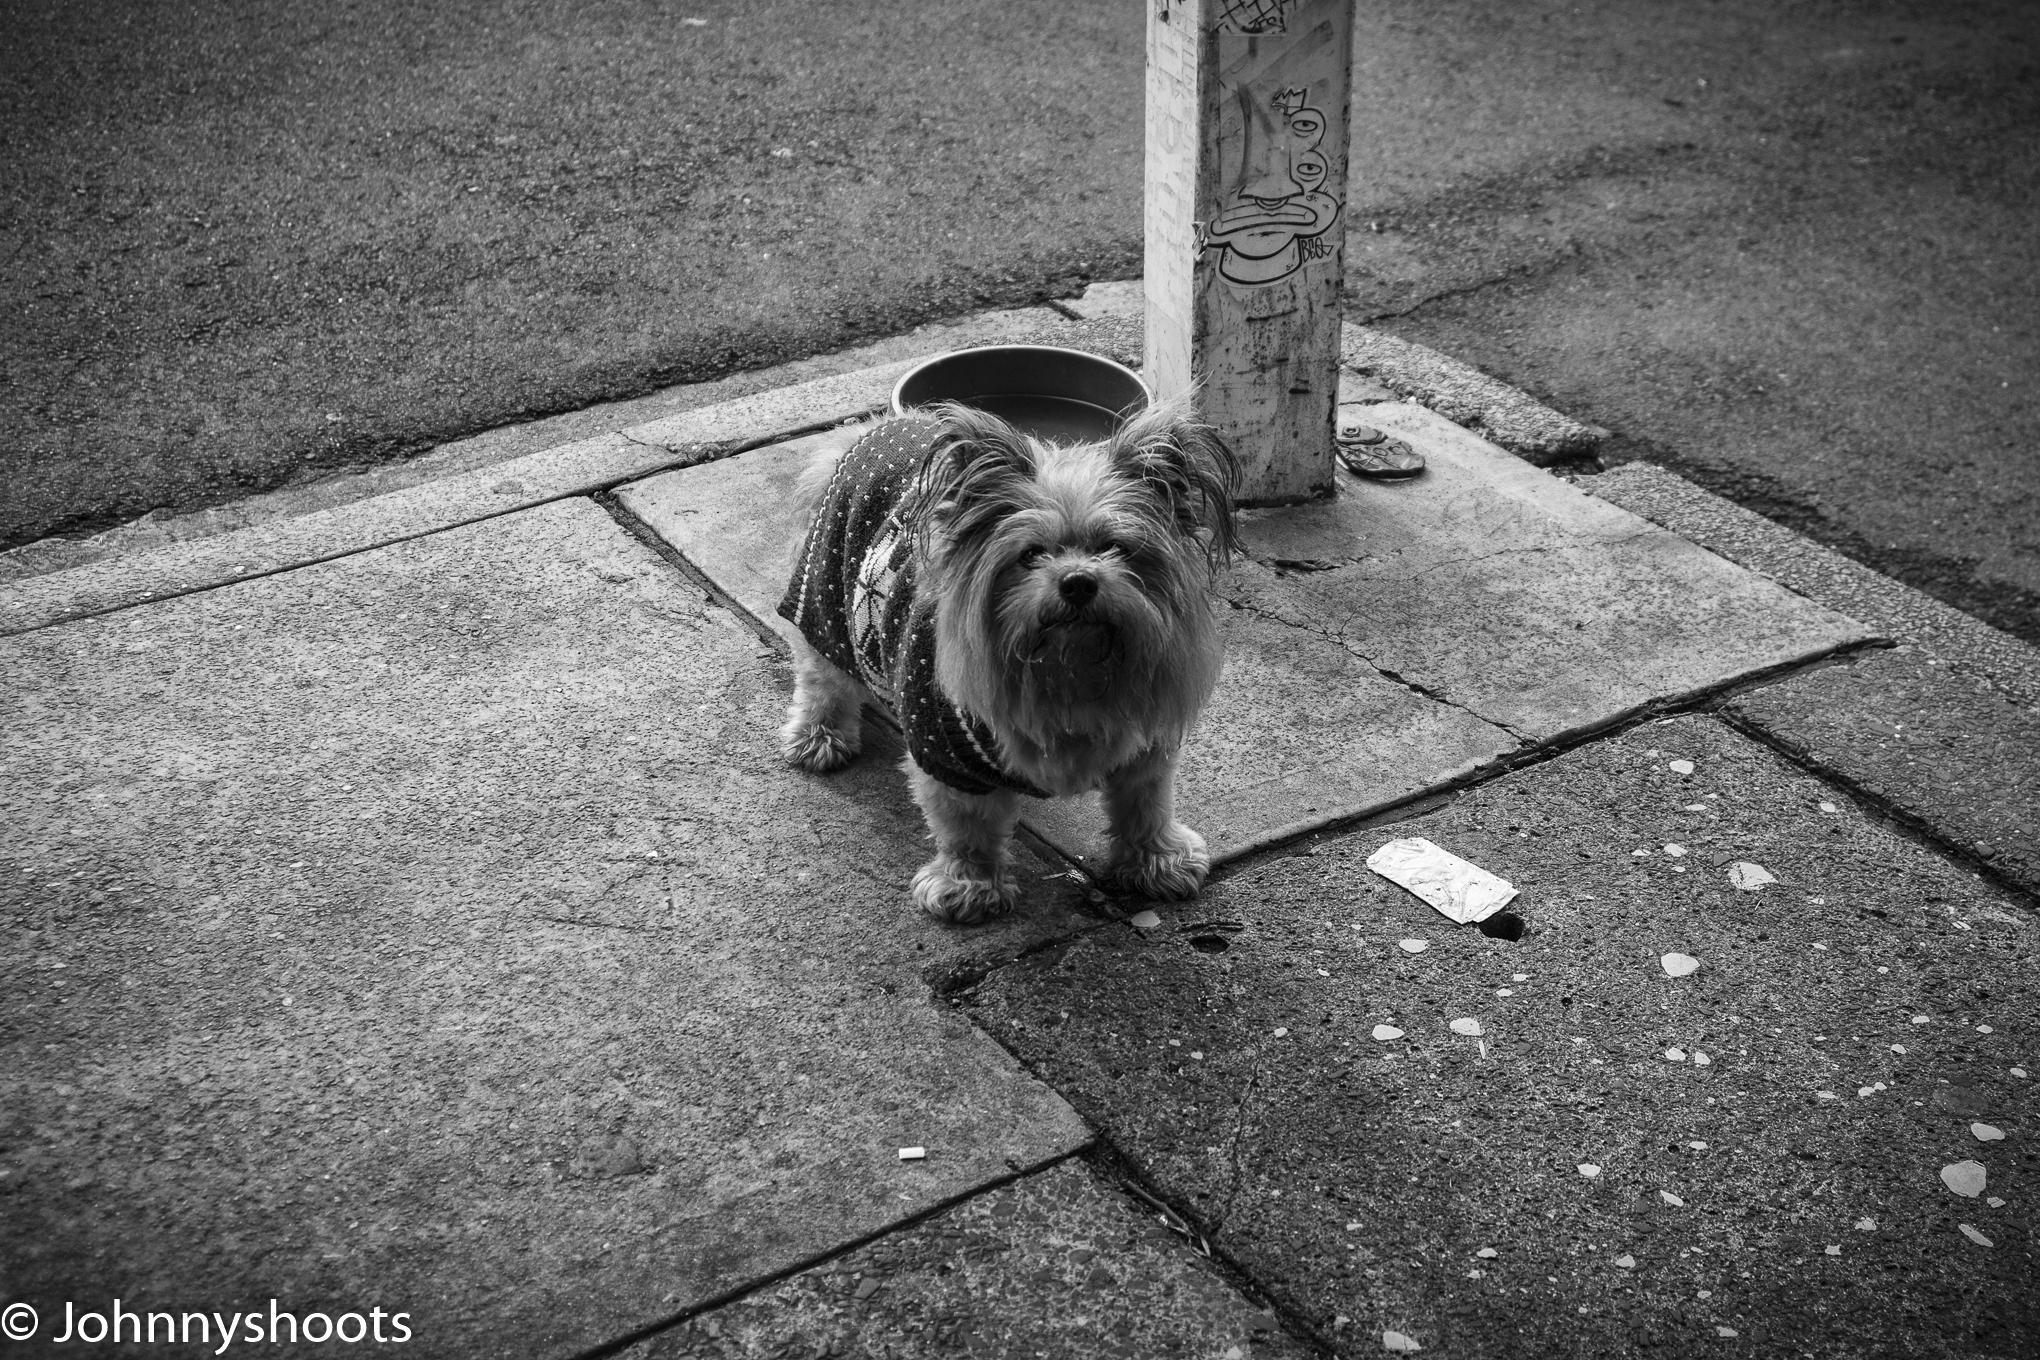 Another Newtown dog shot on the NEX-7